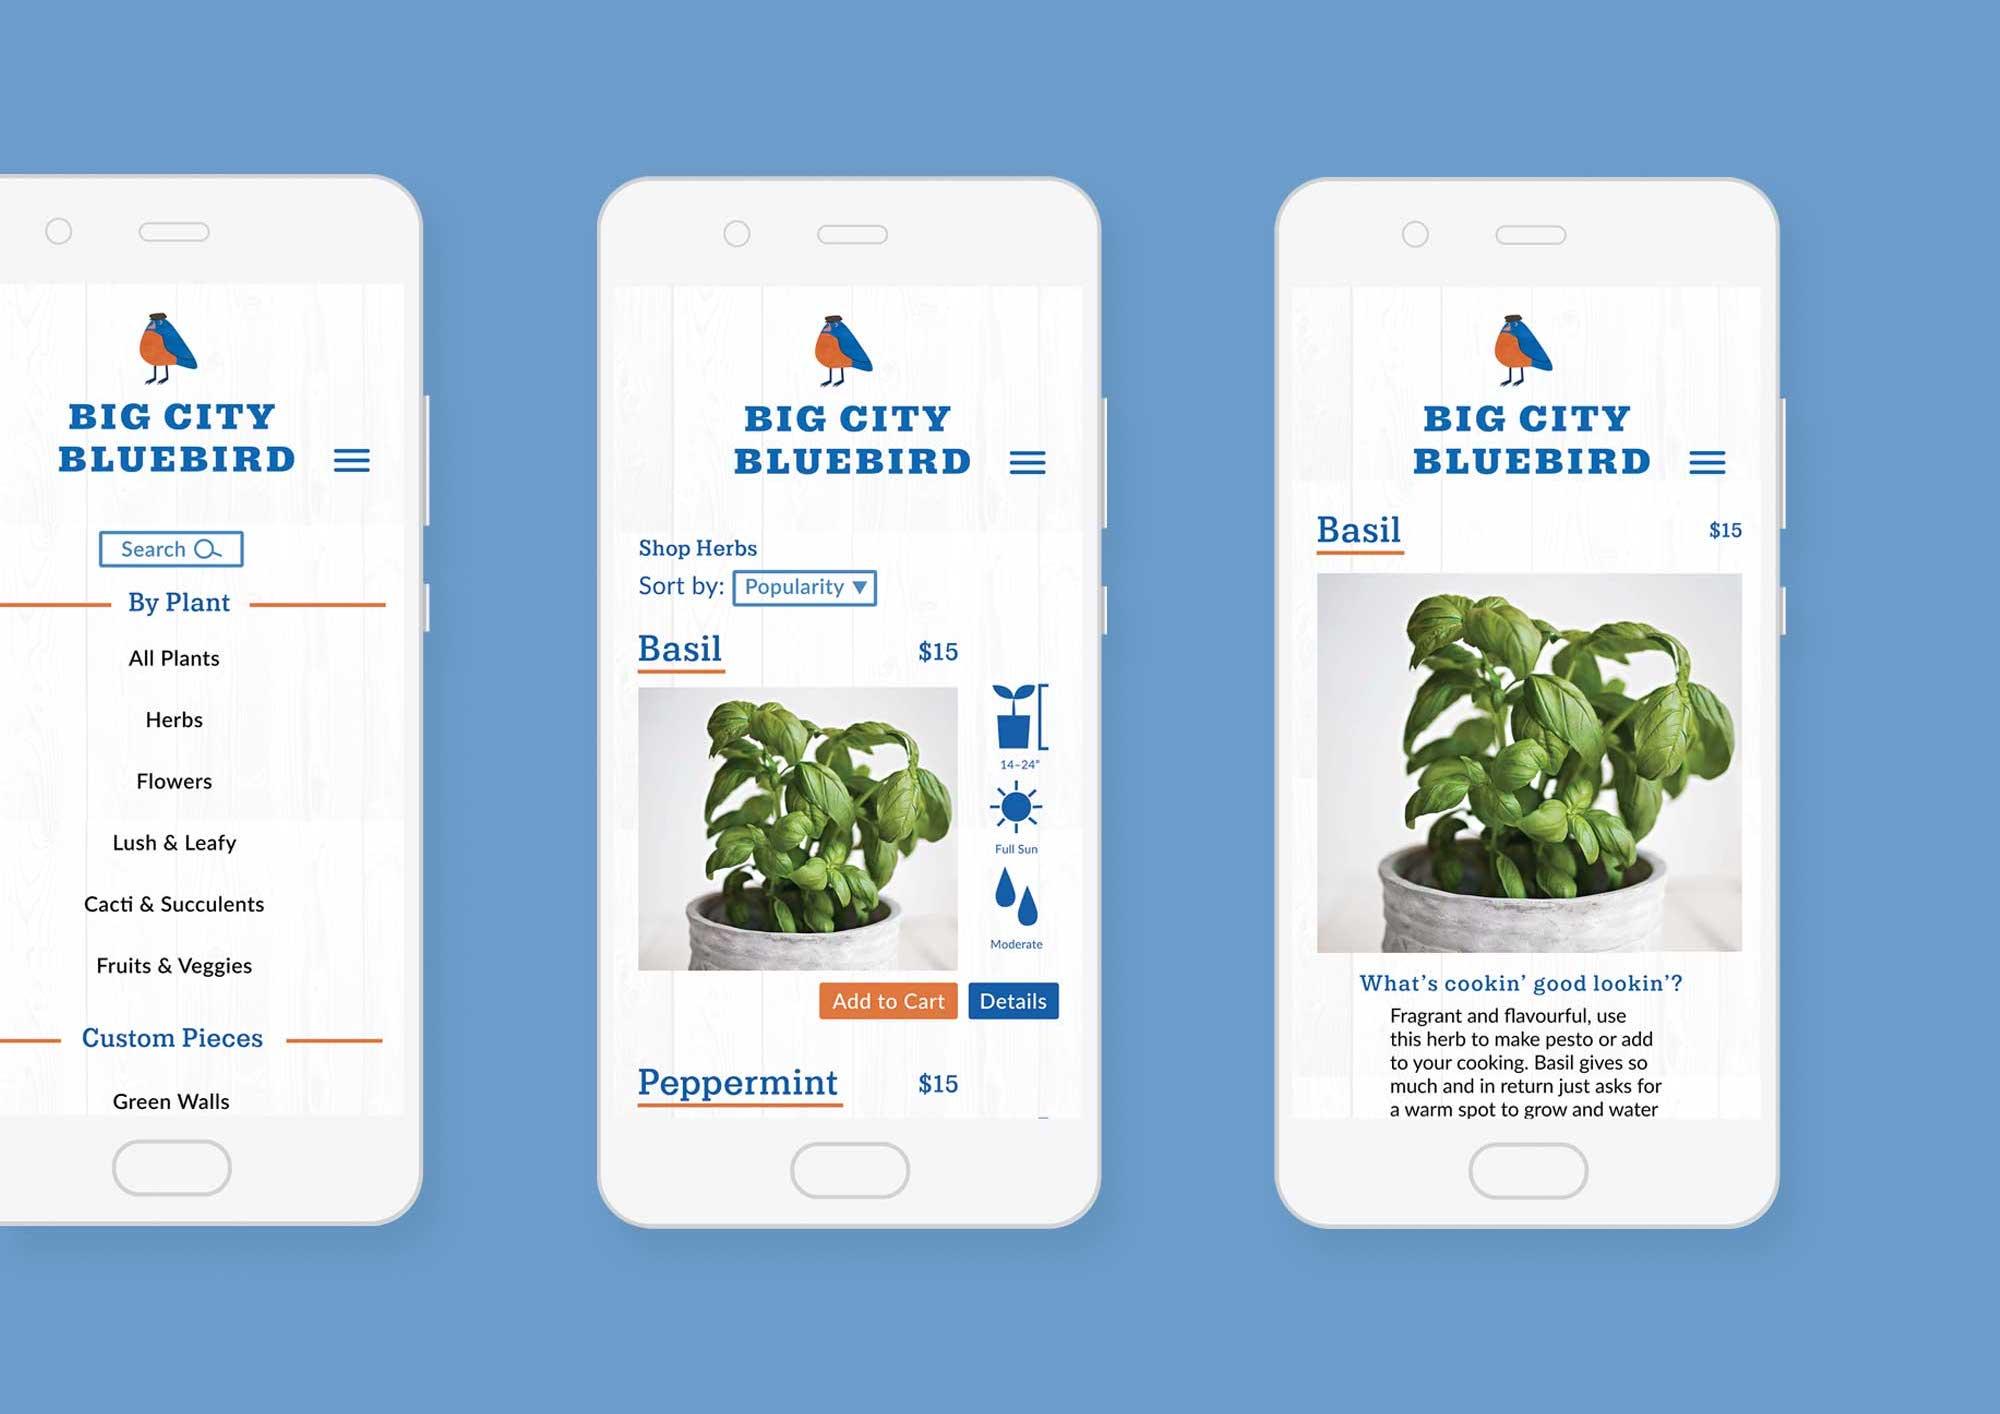 Big City Bluebird shop for plants